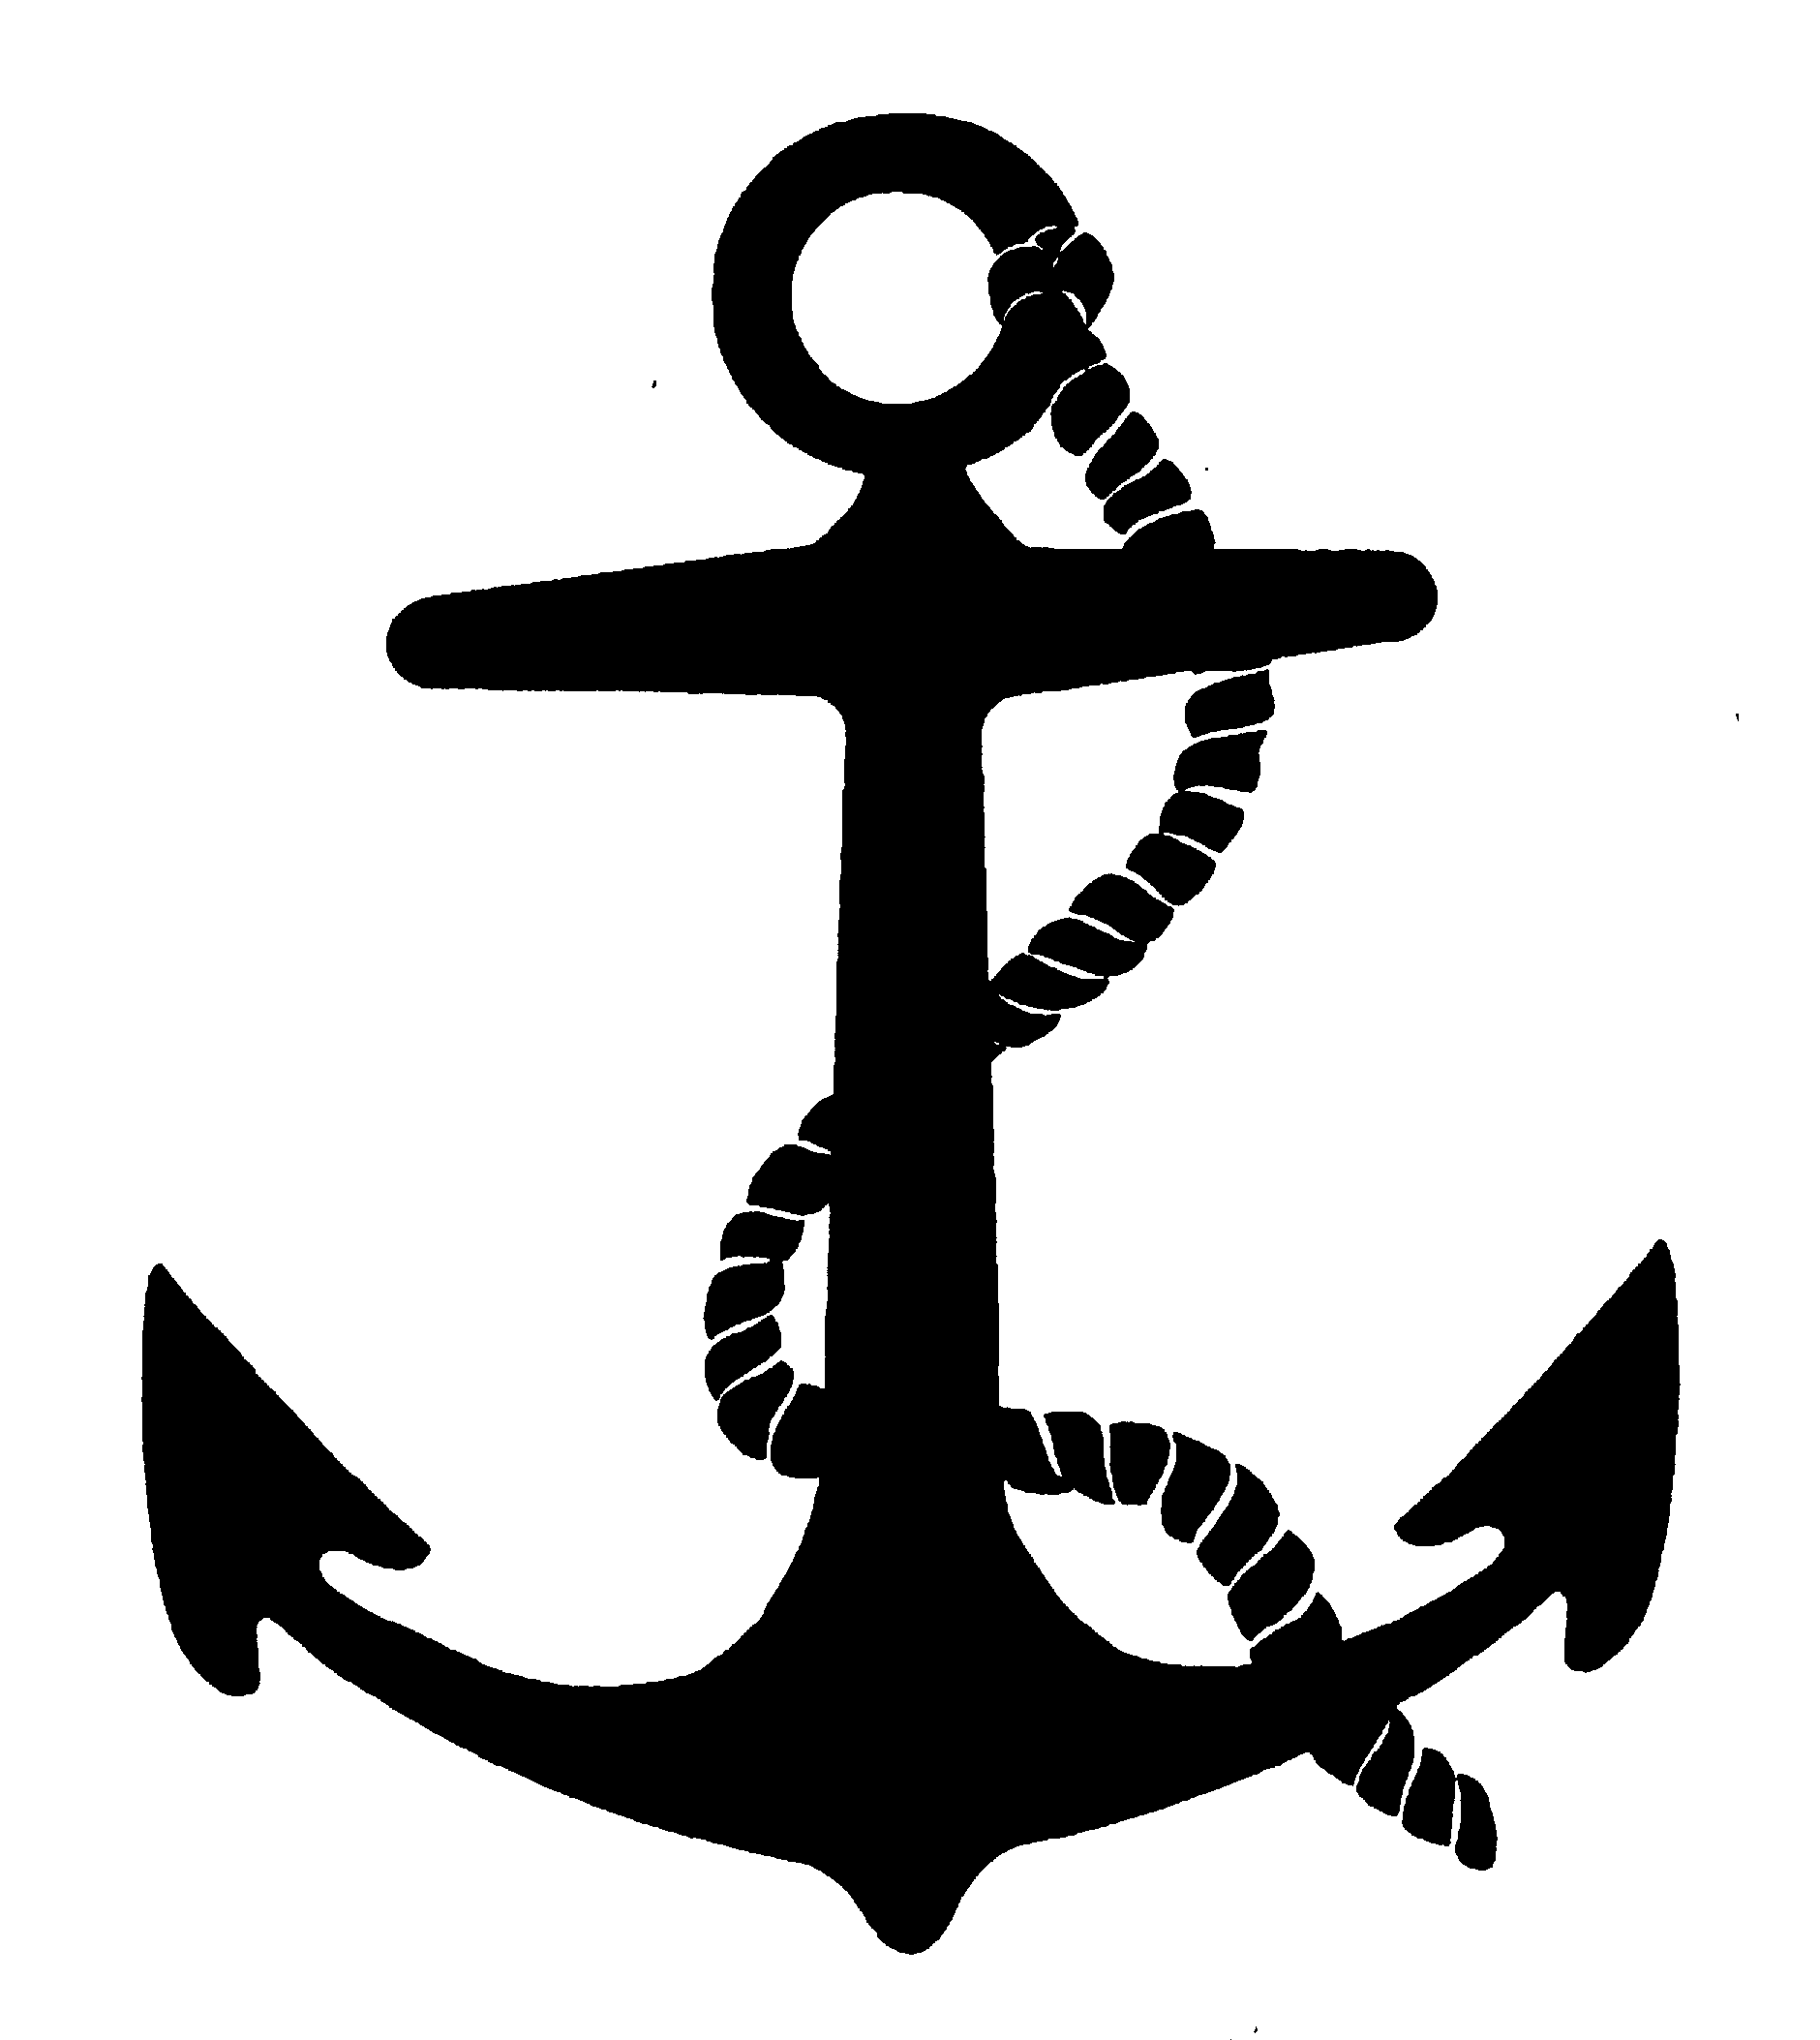 Anchor clipart cruise Clip cute%20anchor%20clip%20art Art Anchor Free